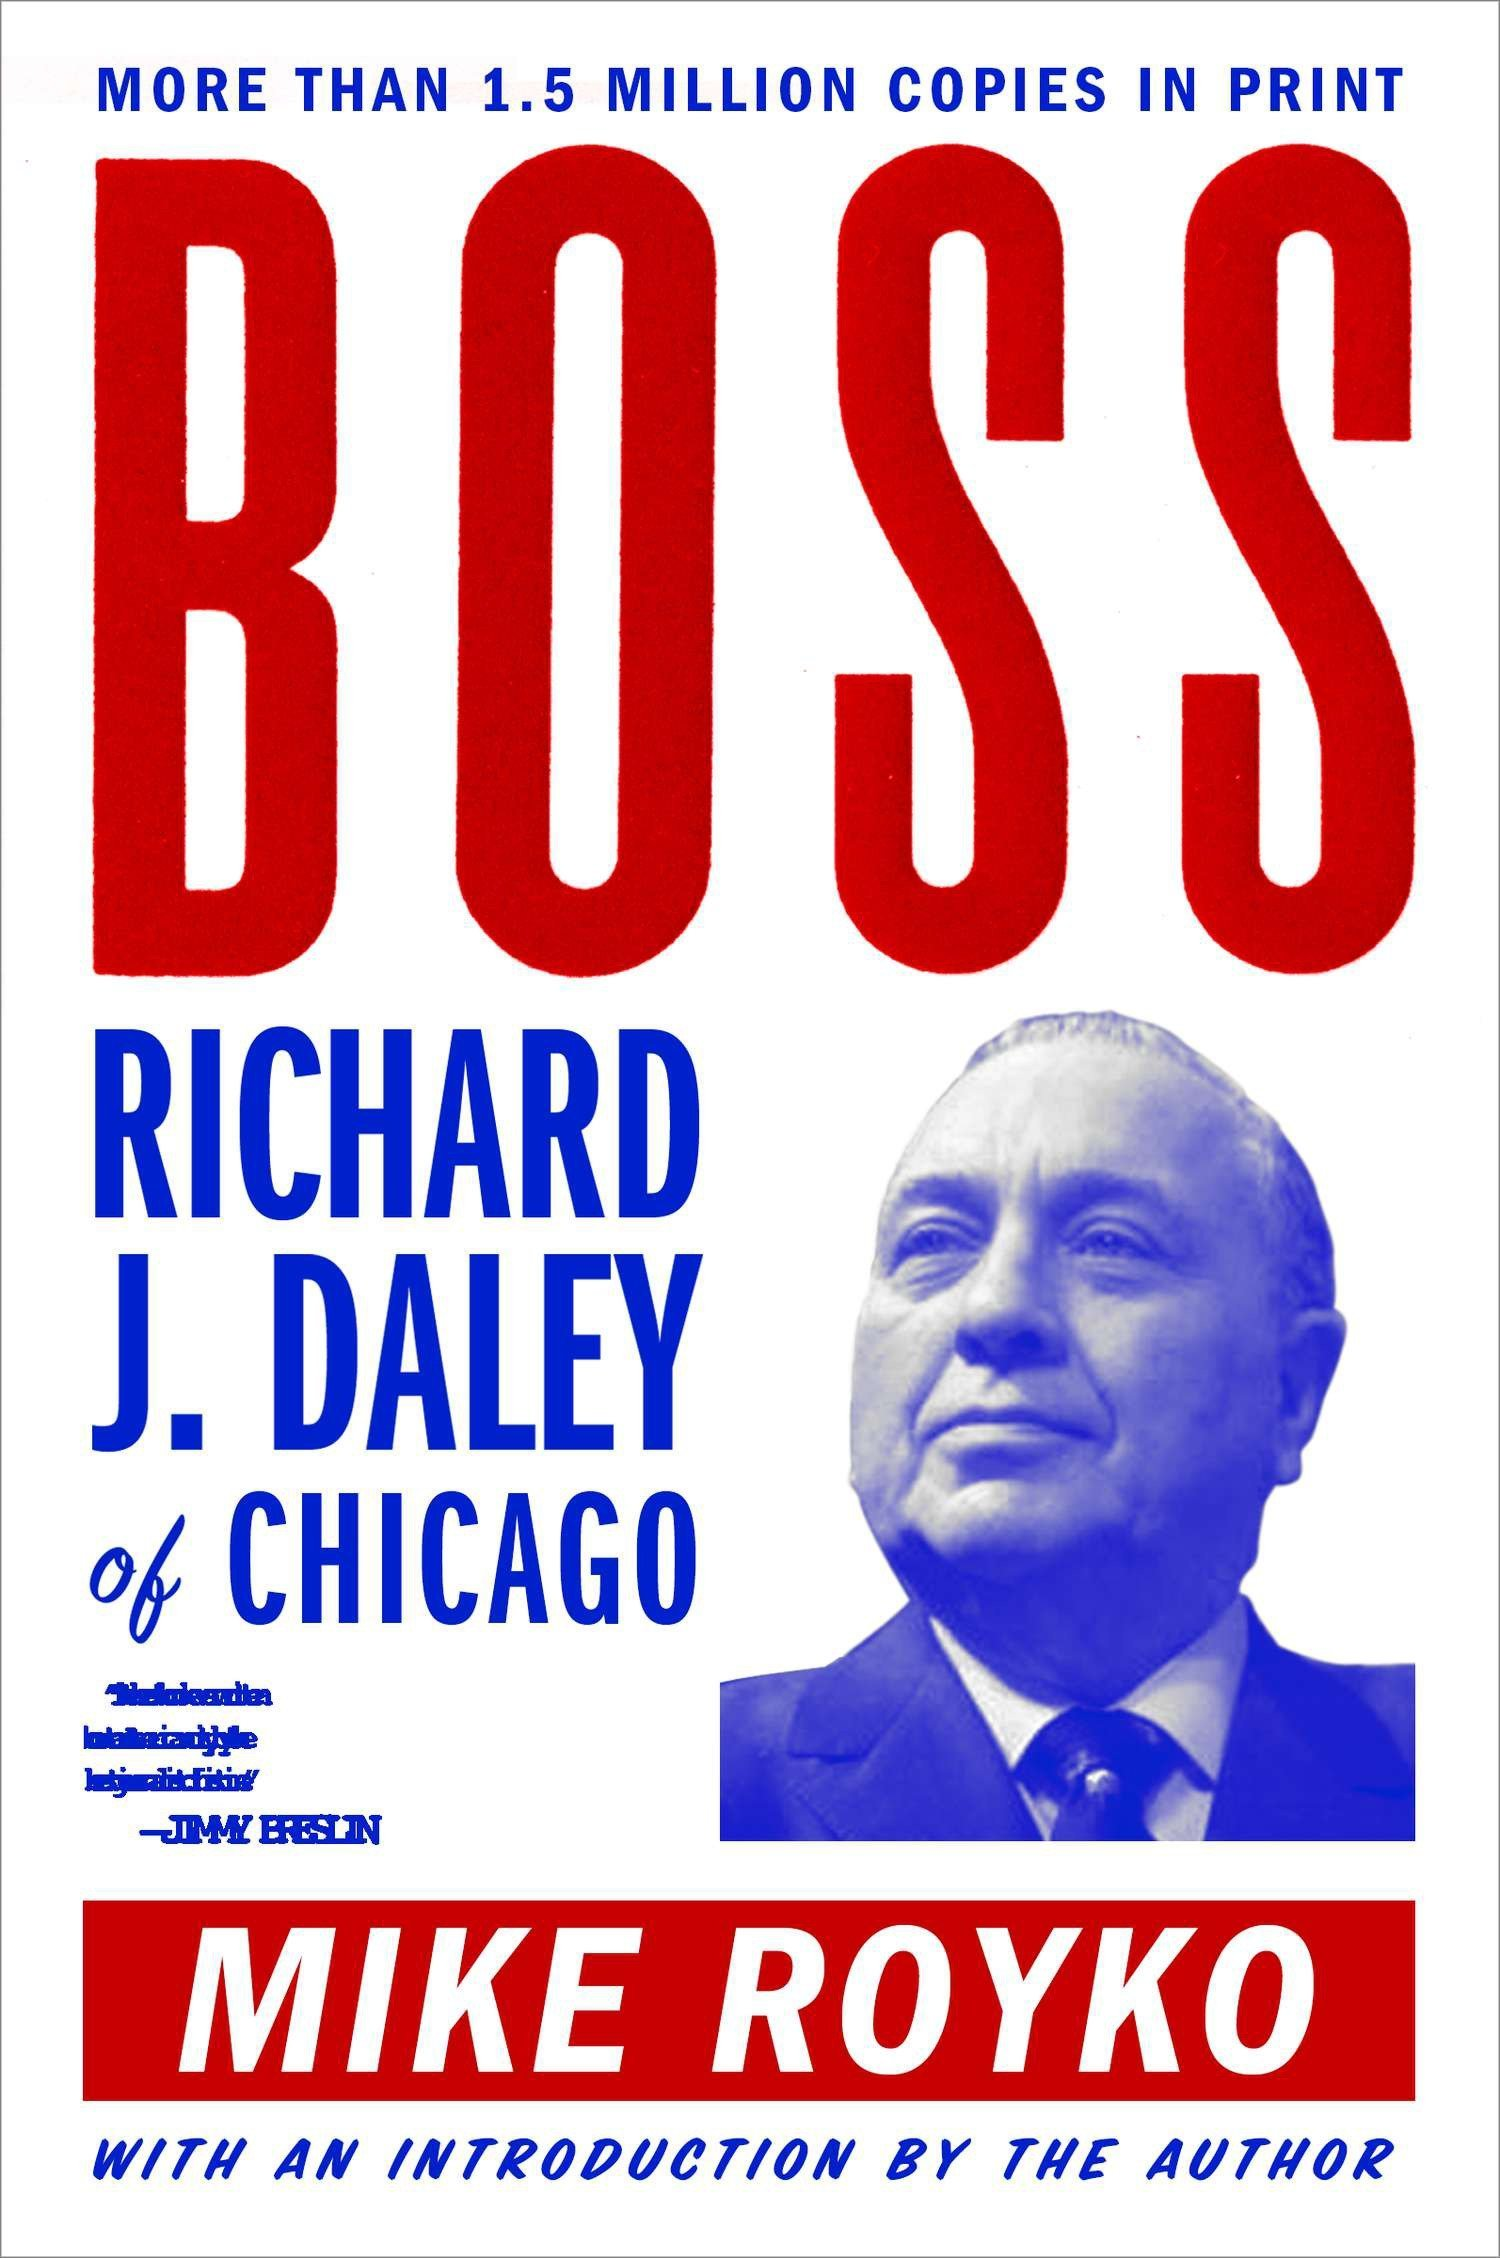 Richard J. Daley of Chicago